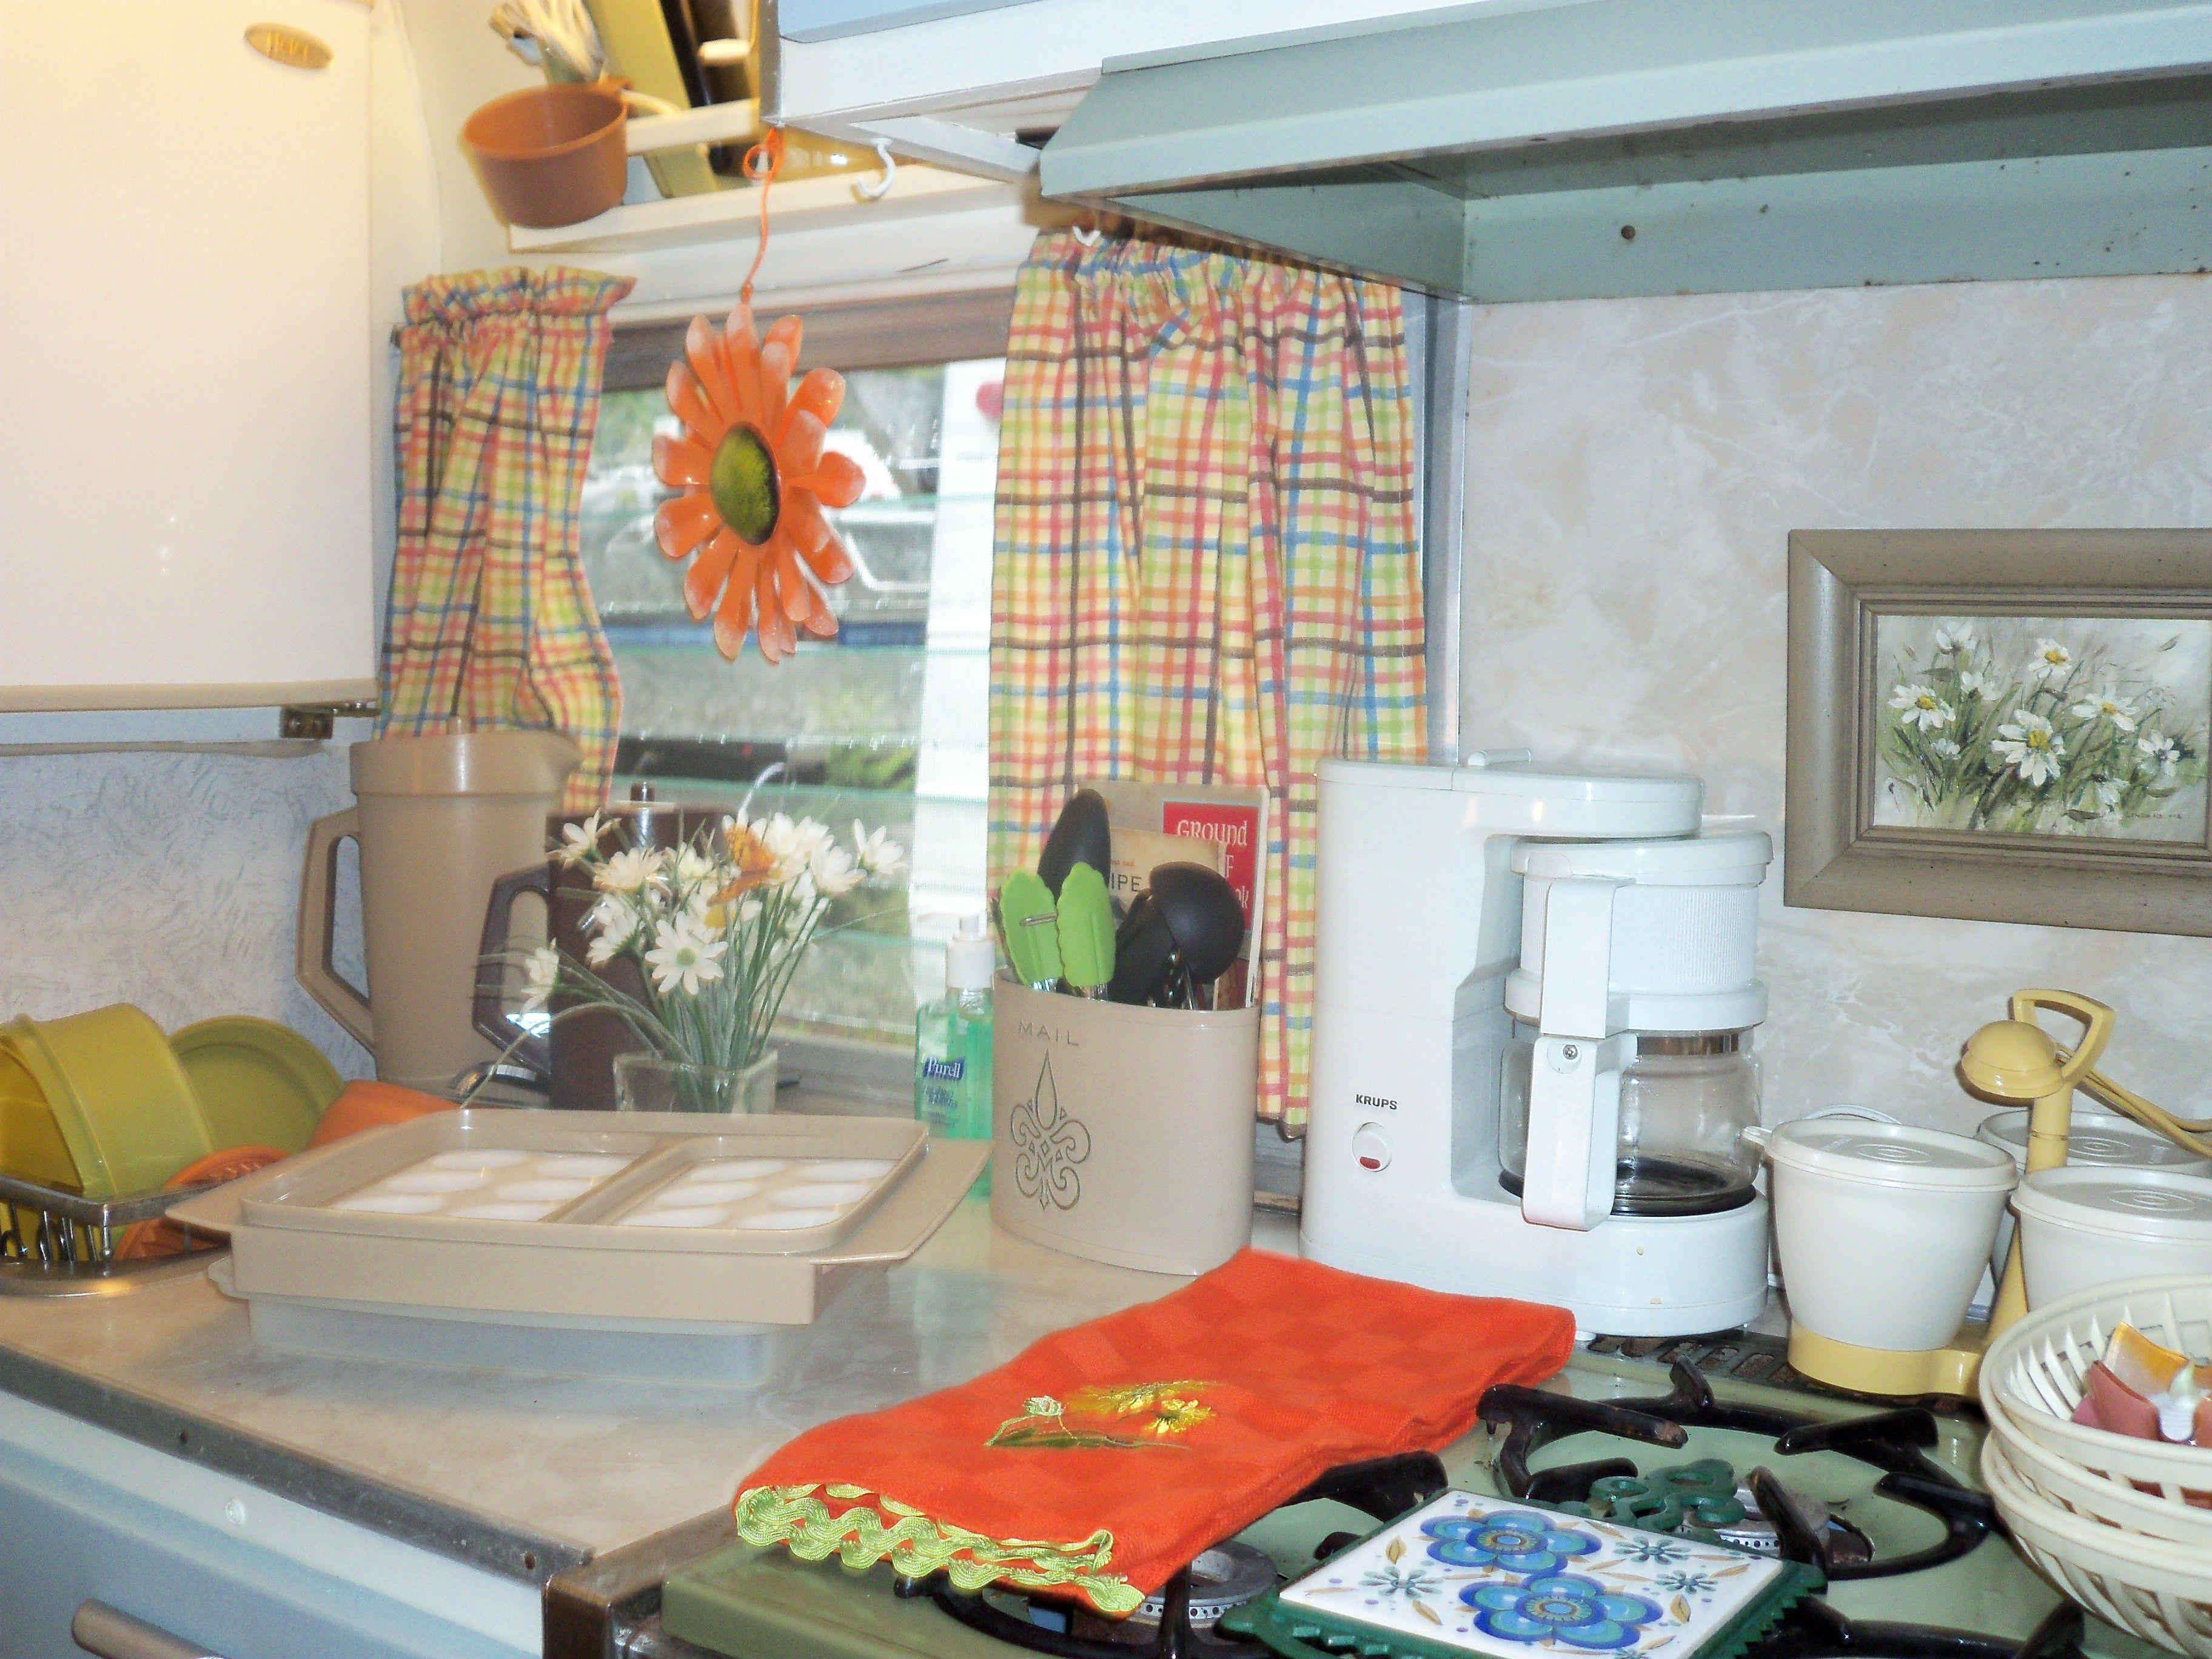 Kitchen | Our 1970 Shasta Compact-Wanda | Vintage travel ...